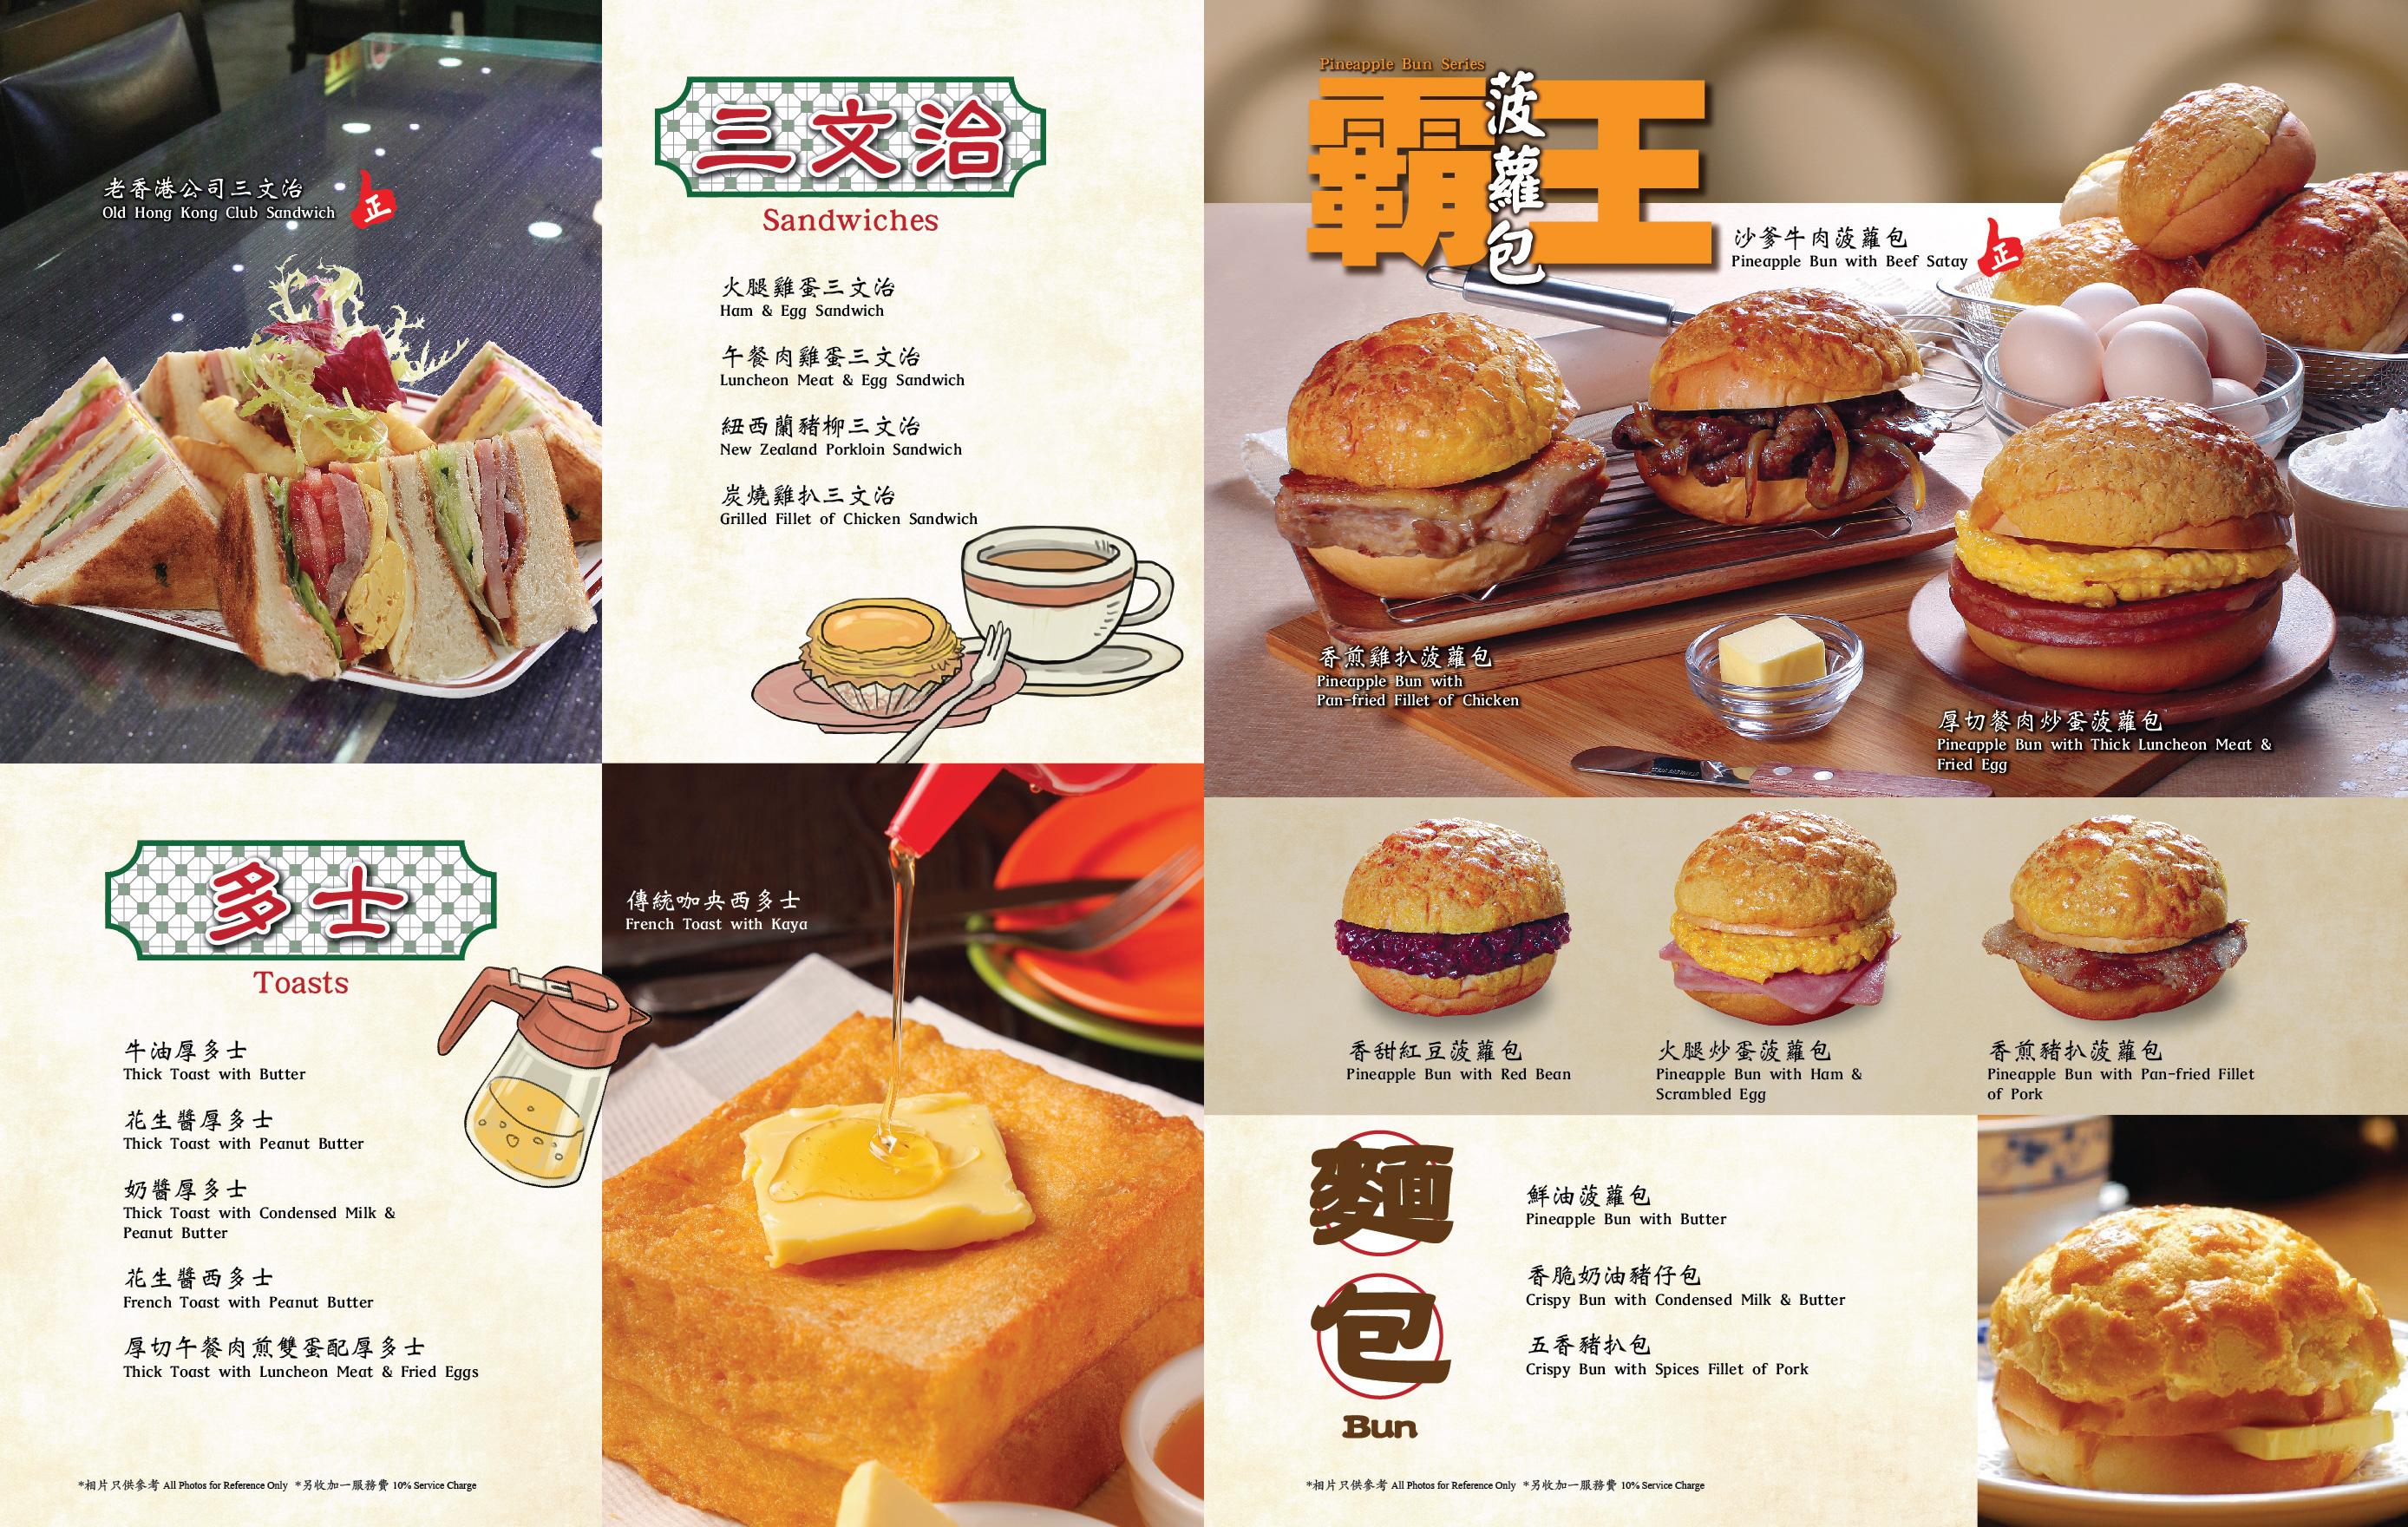 oldhk main menu web version-16